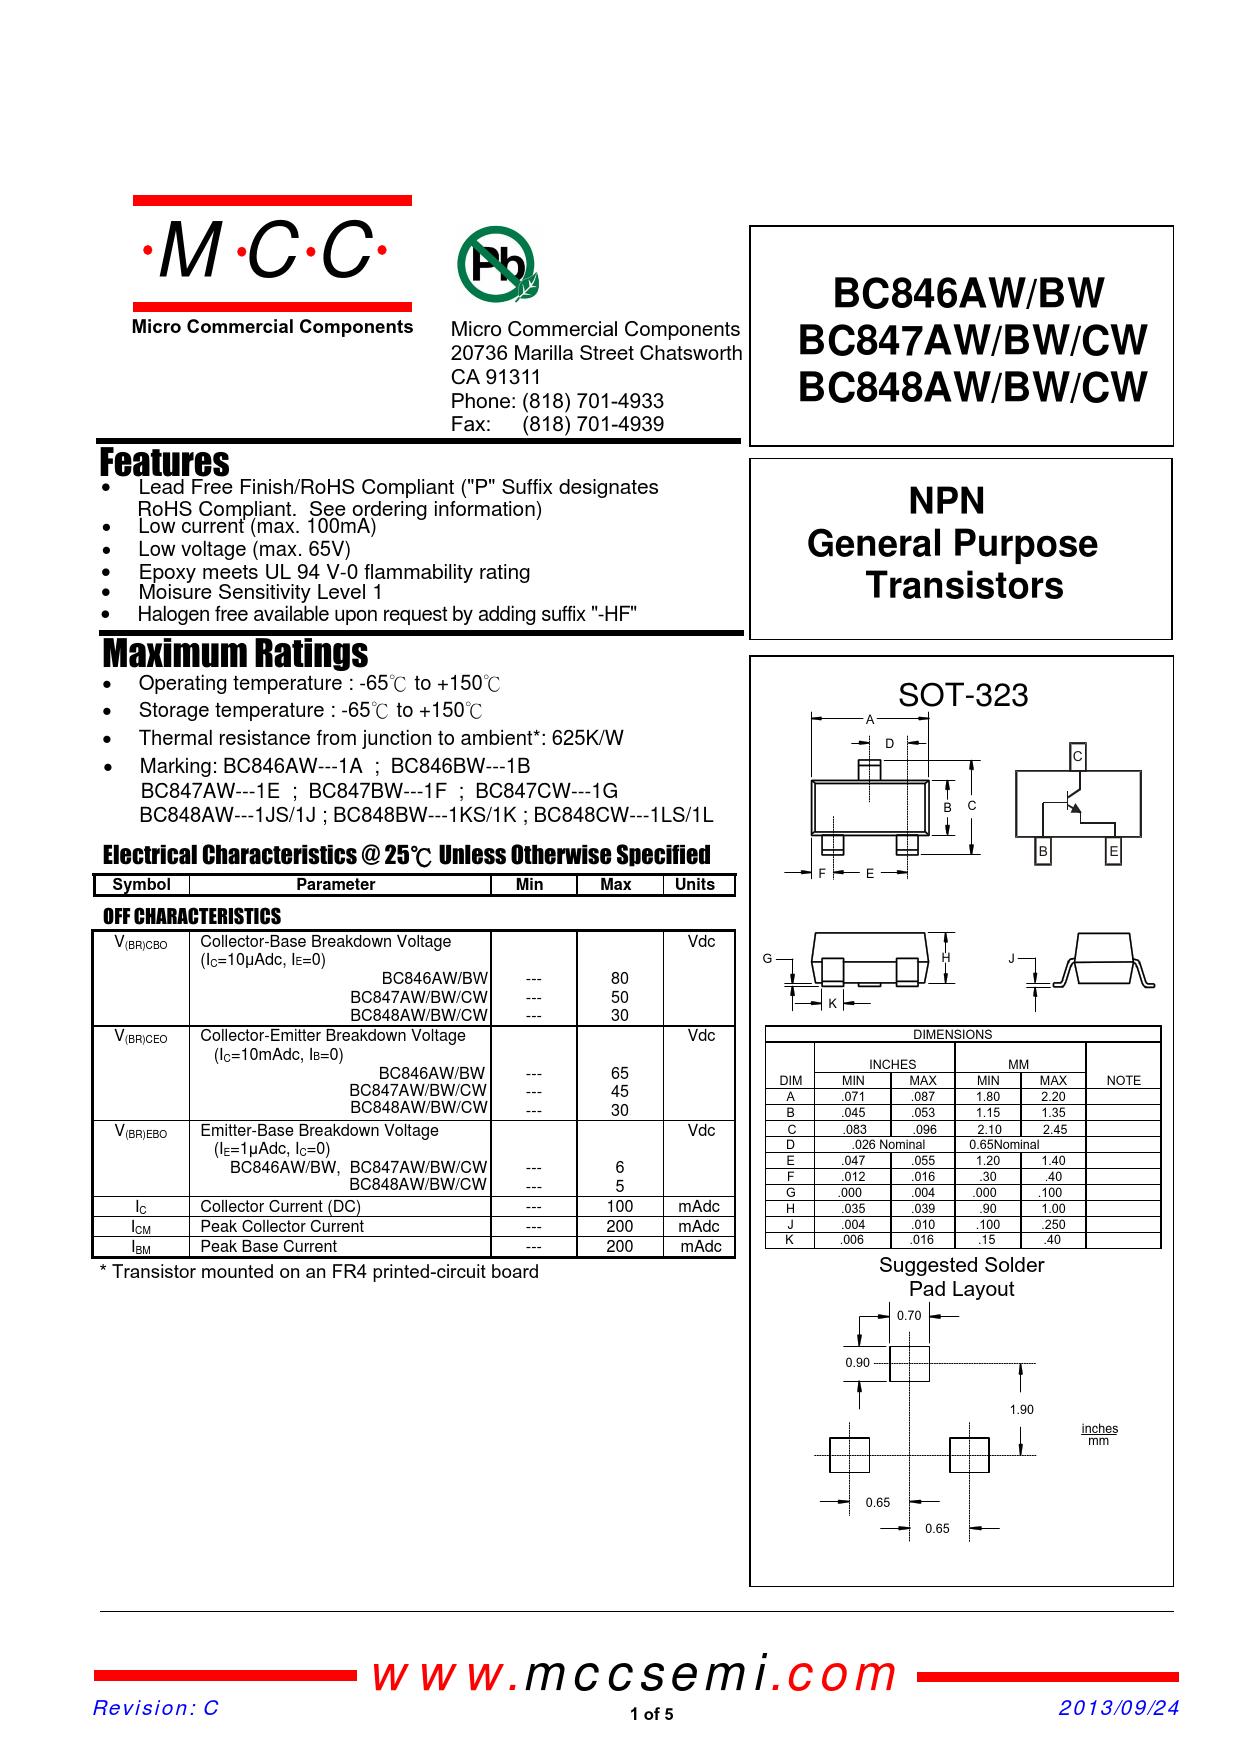 Datasheet BC846AW, BC846BW, BC847AW, BC847BW, BC847CW, BC848AW, BC848BW, BC848CW MCC